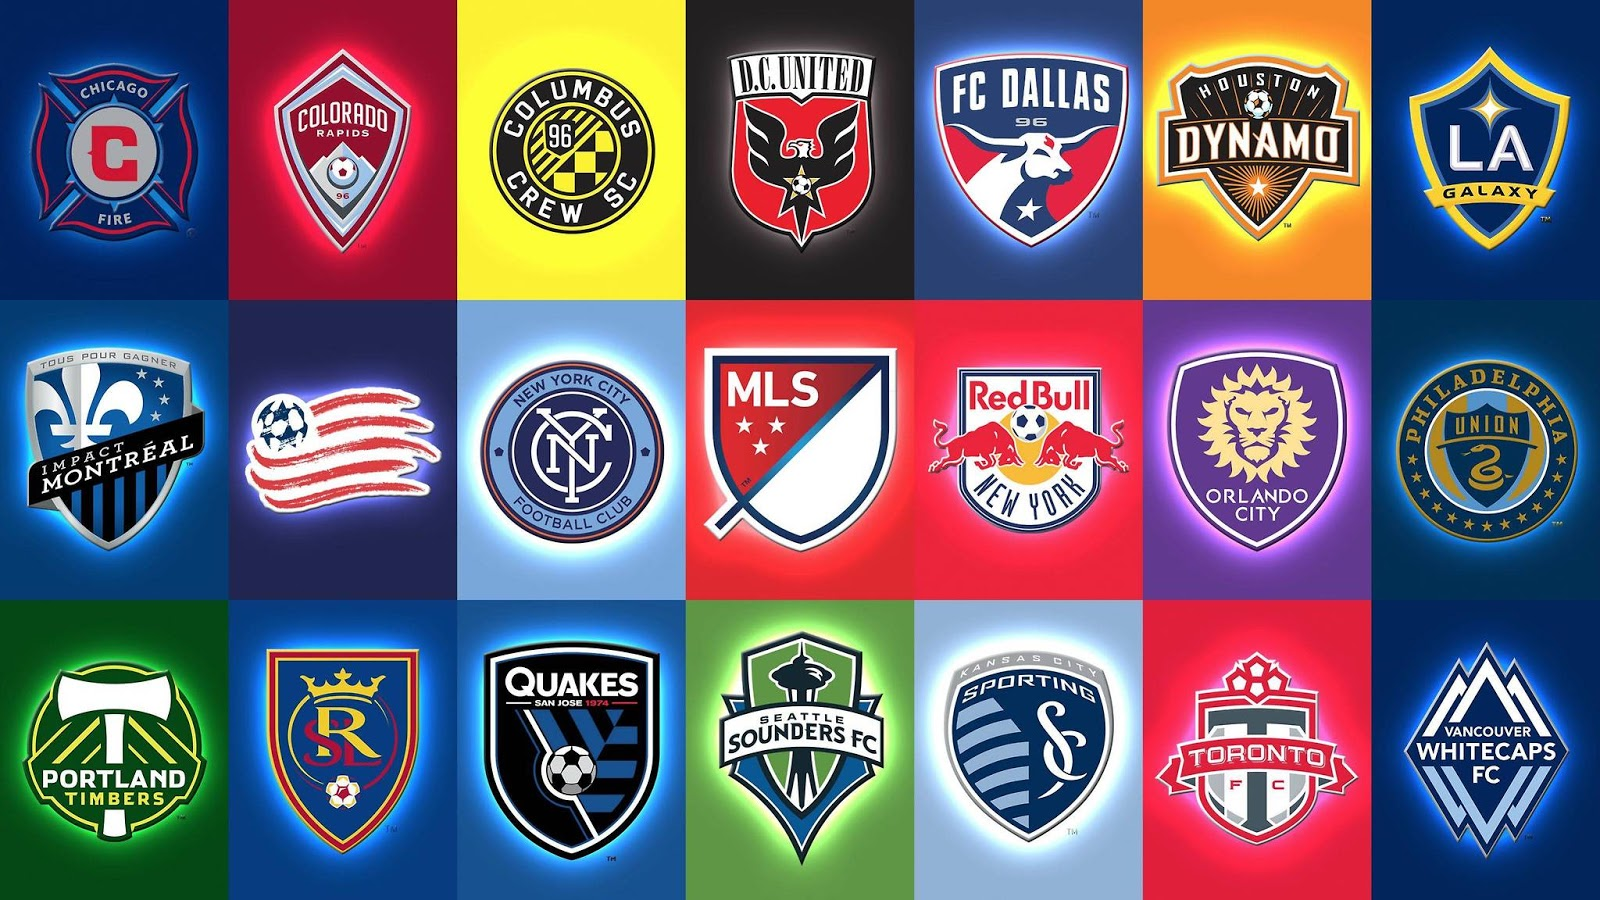 Atlanta United Fc Iphone Wallpaper U S Super Soccer Major League Soccer Temporada 2016